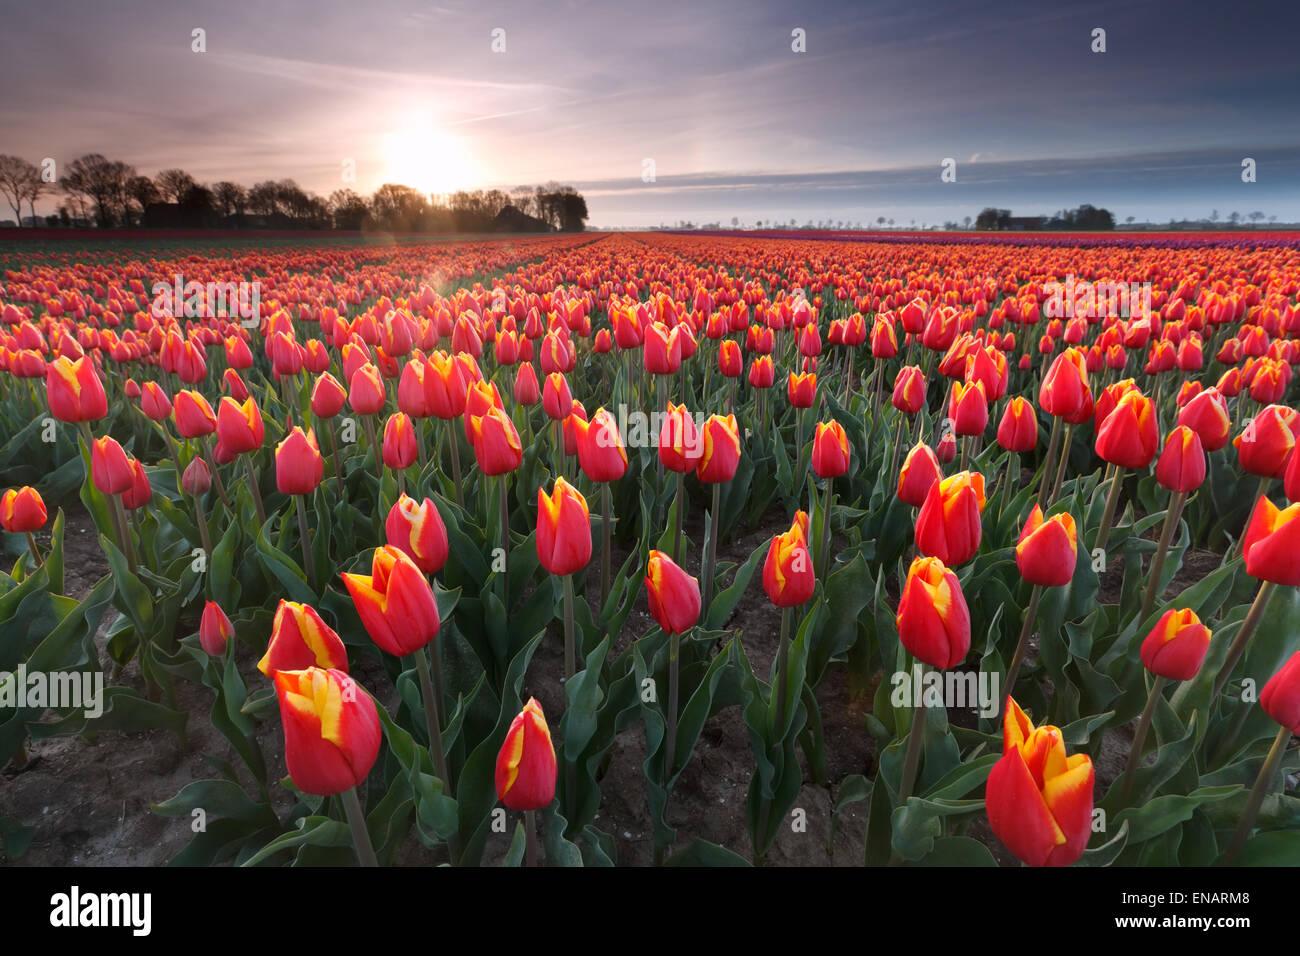 sunrise over red tulip field, Flevoland, Netherlands - Stock Image